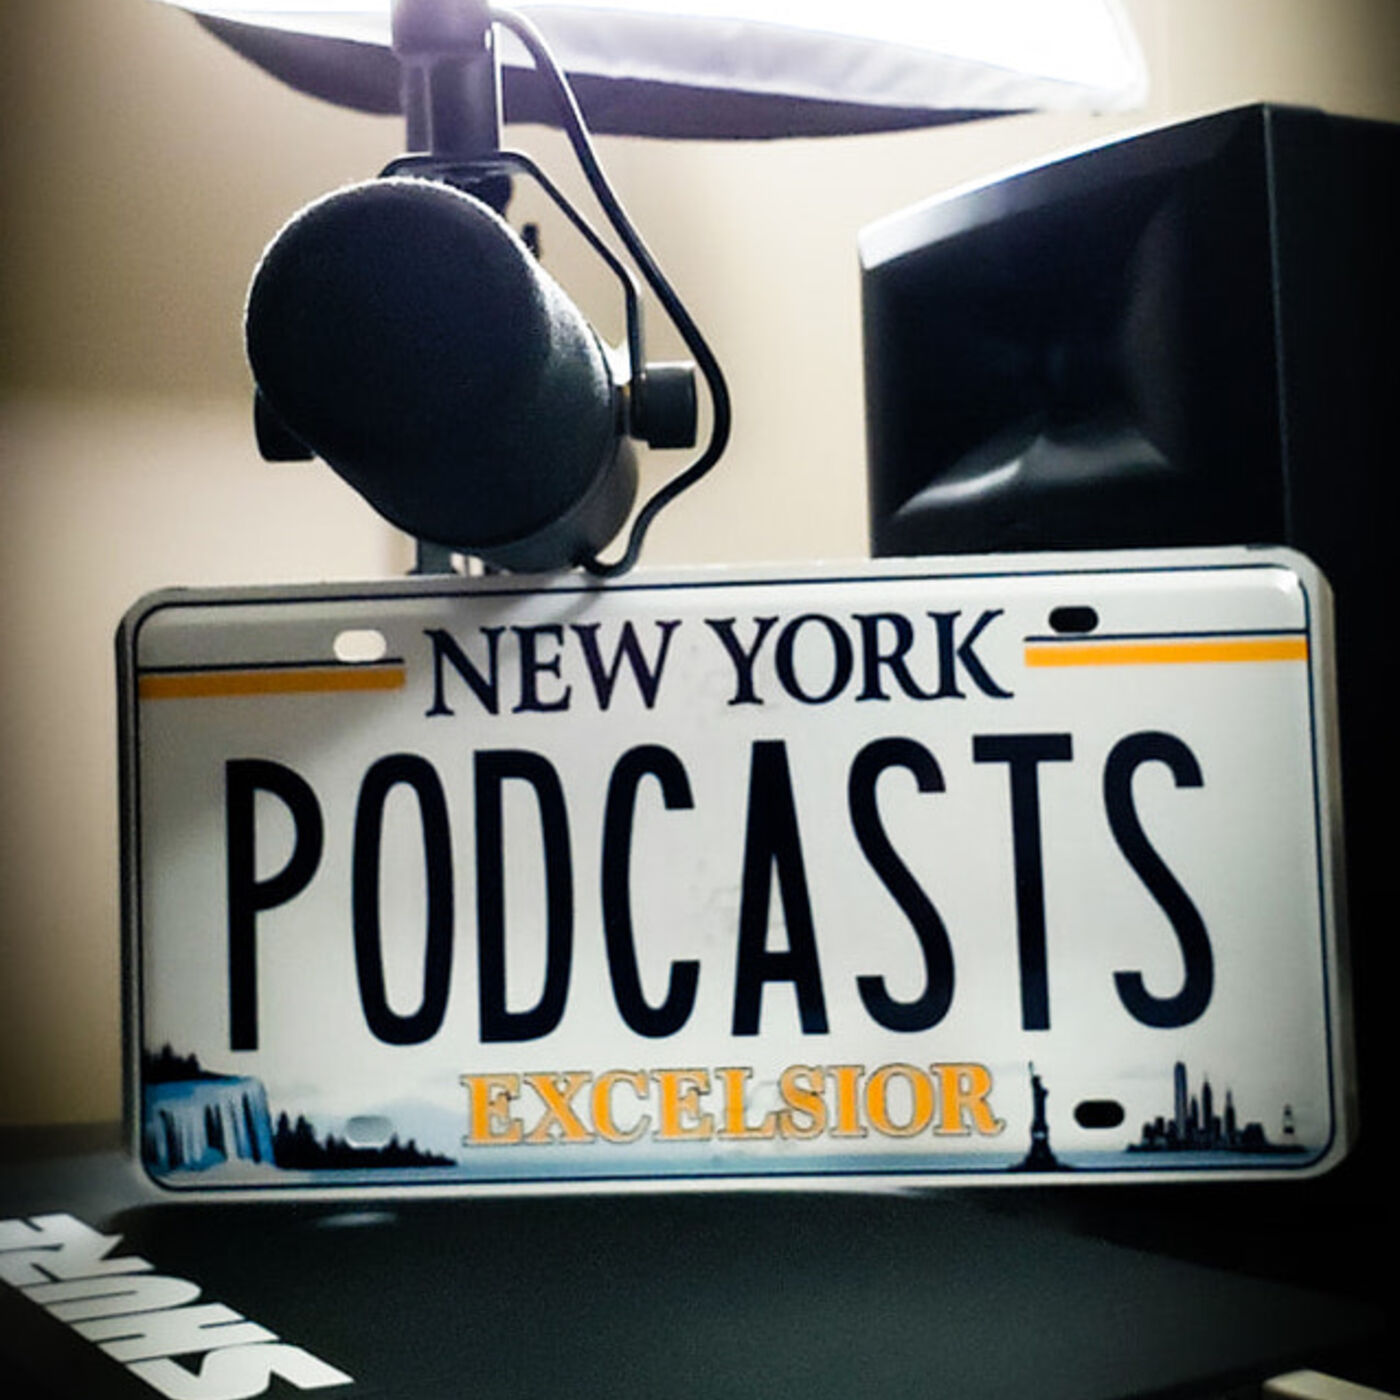 New York State Vanity Plates!